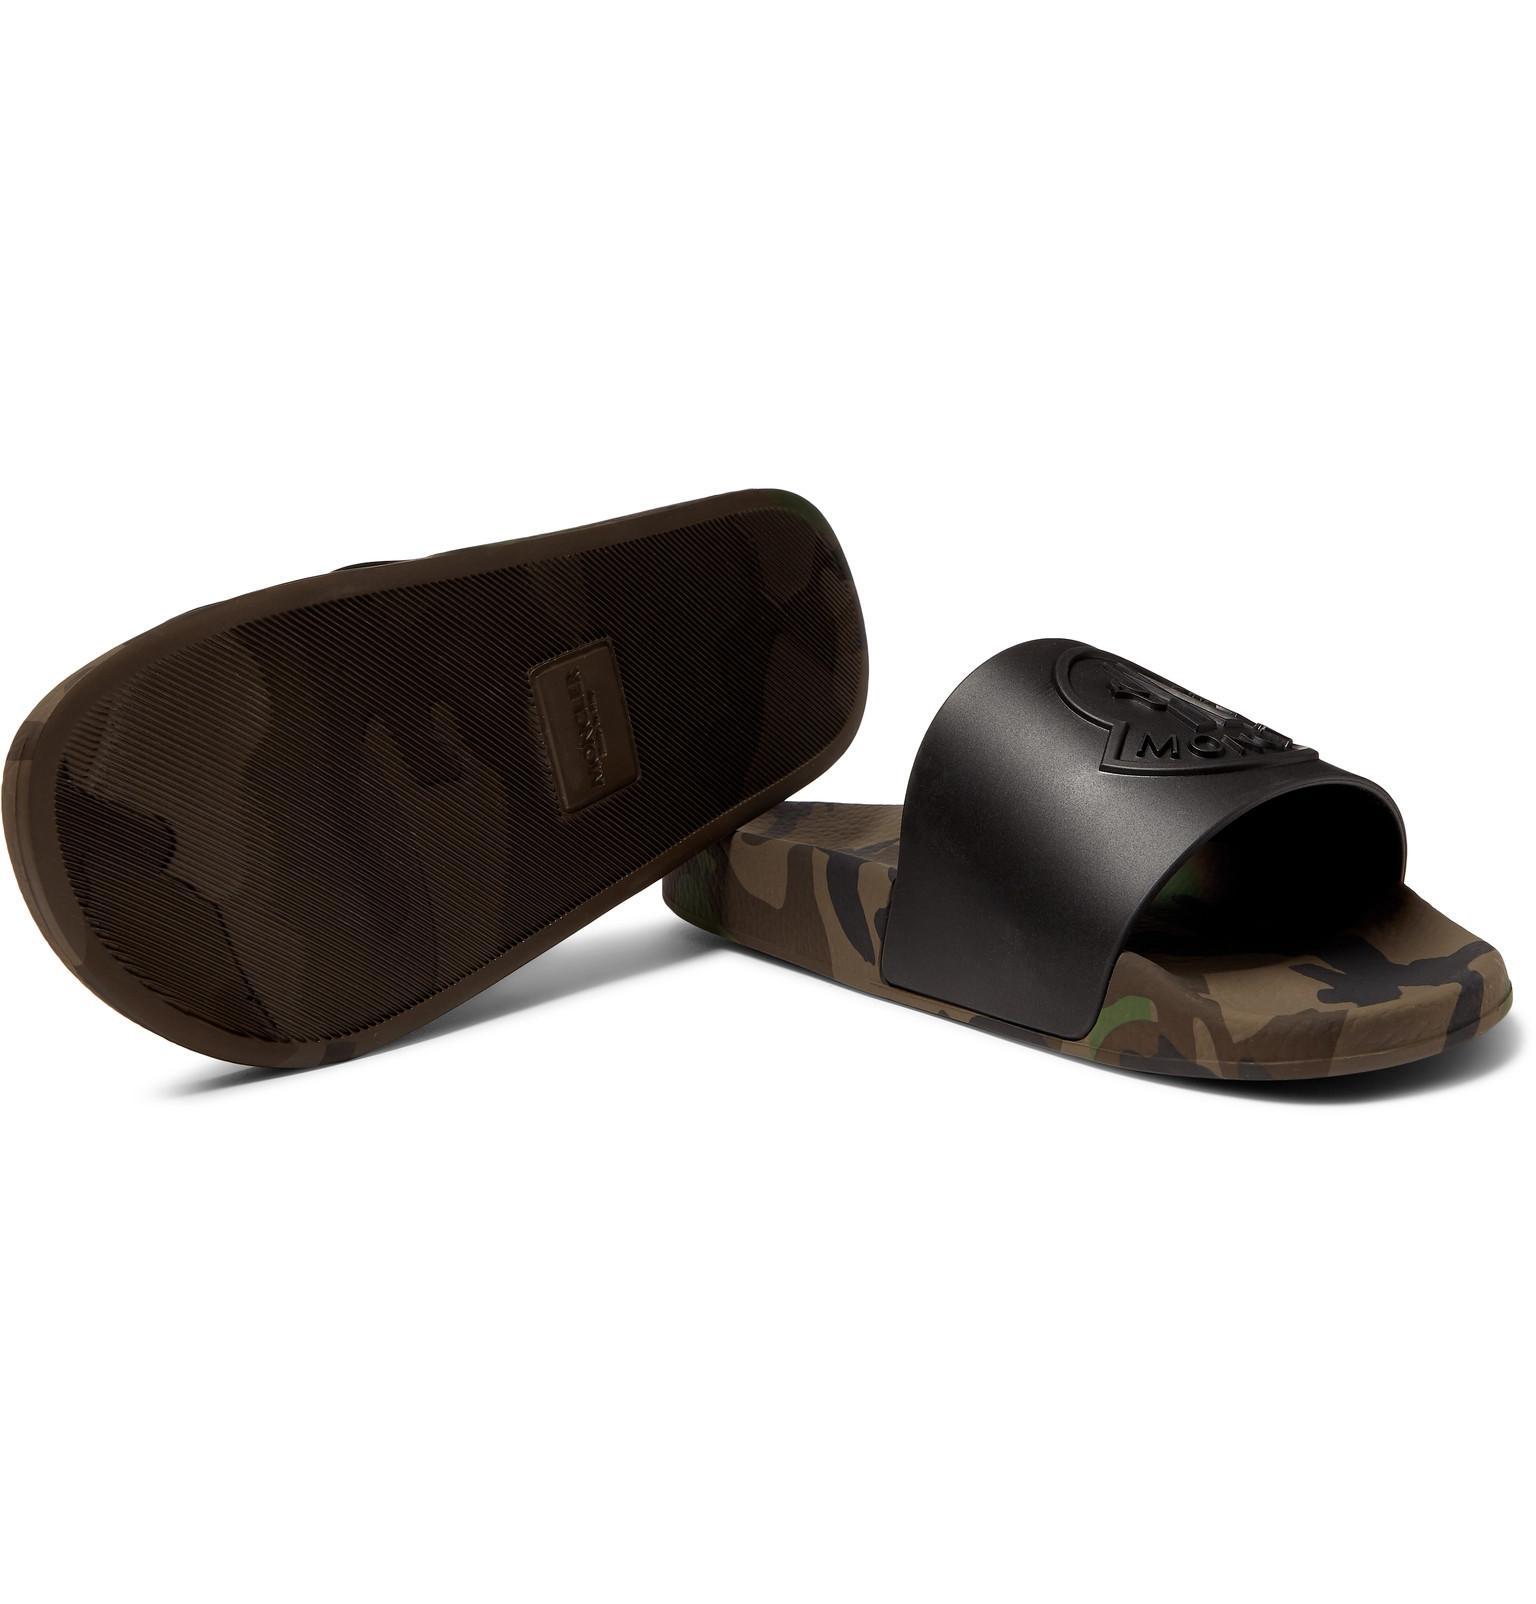 b1a92cbc593f Moncler Basile Logo-embossed Rubber Slides in Black for Men - Lyst